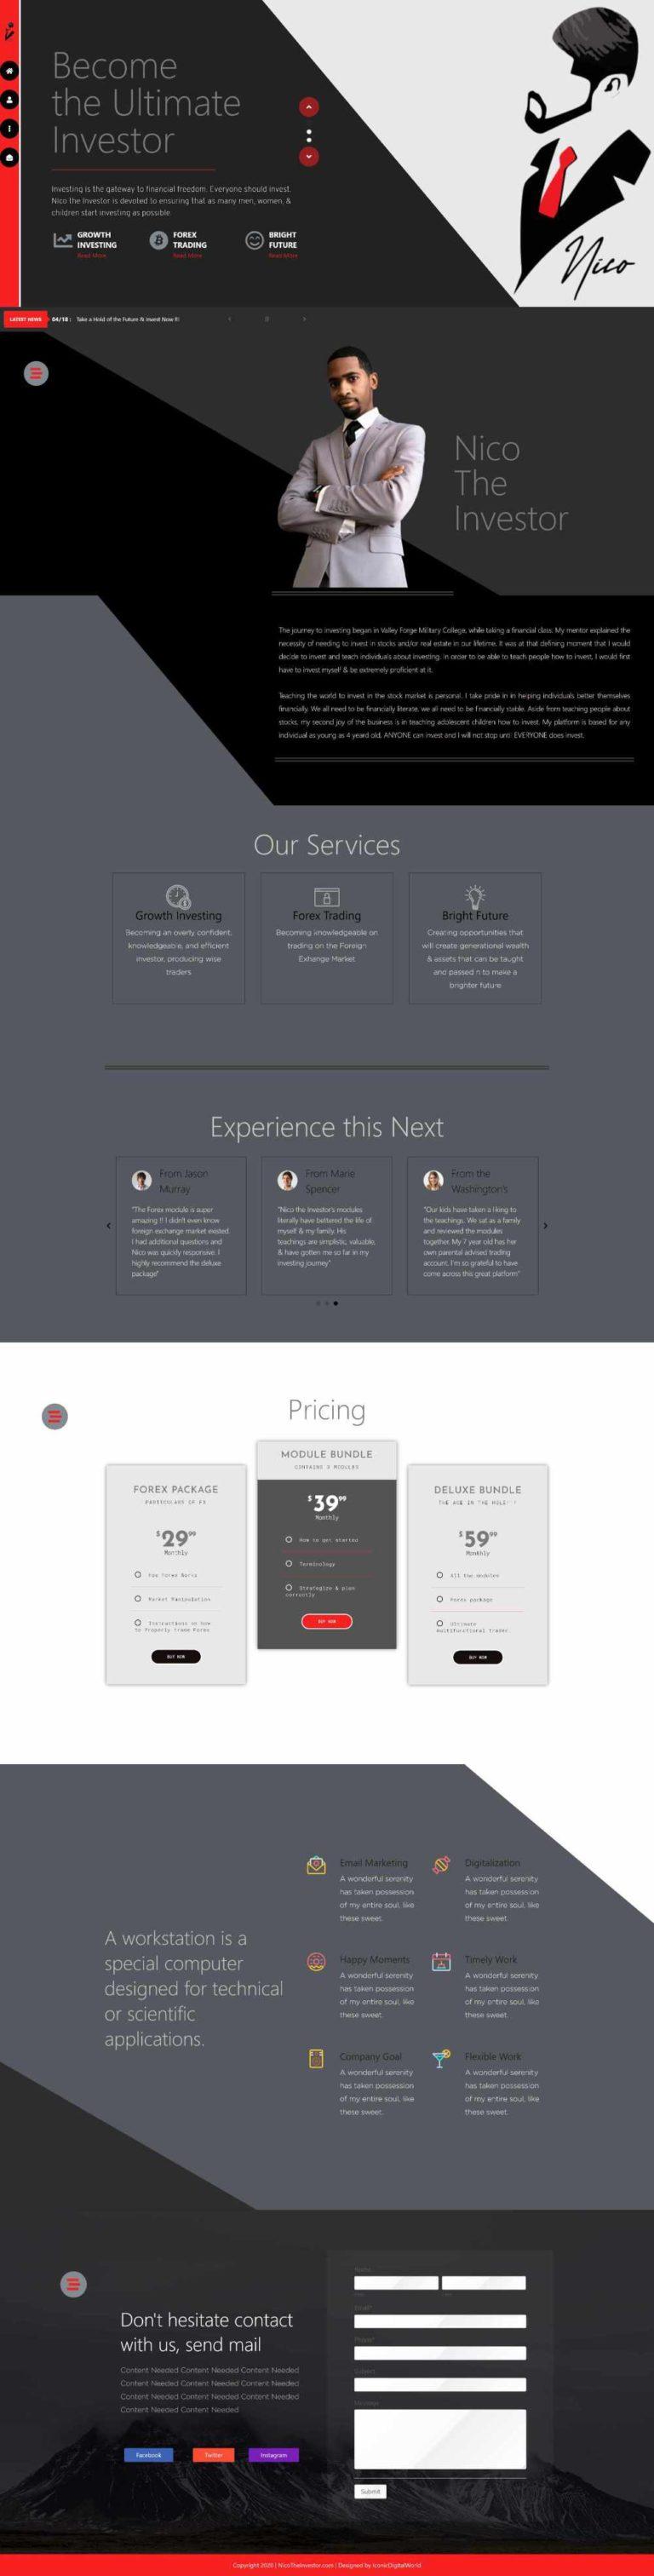 nicotheinvestor-homepage